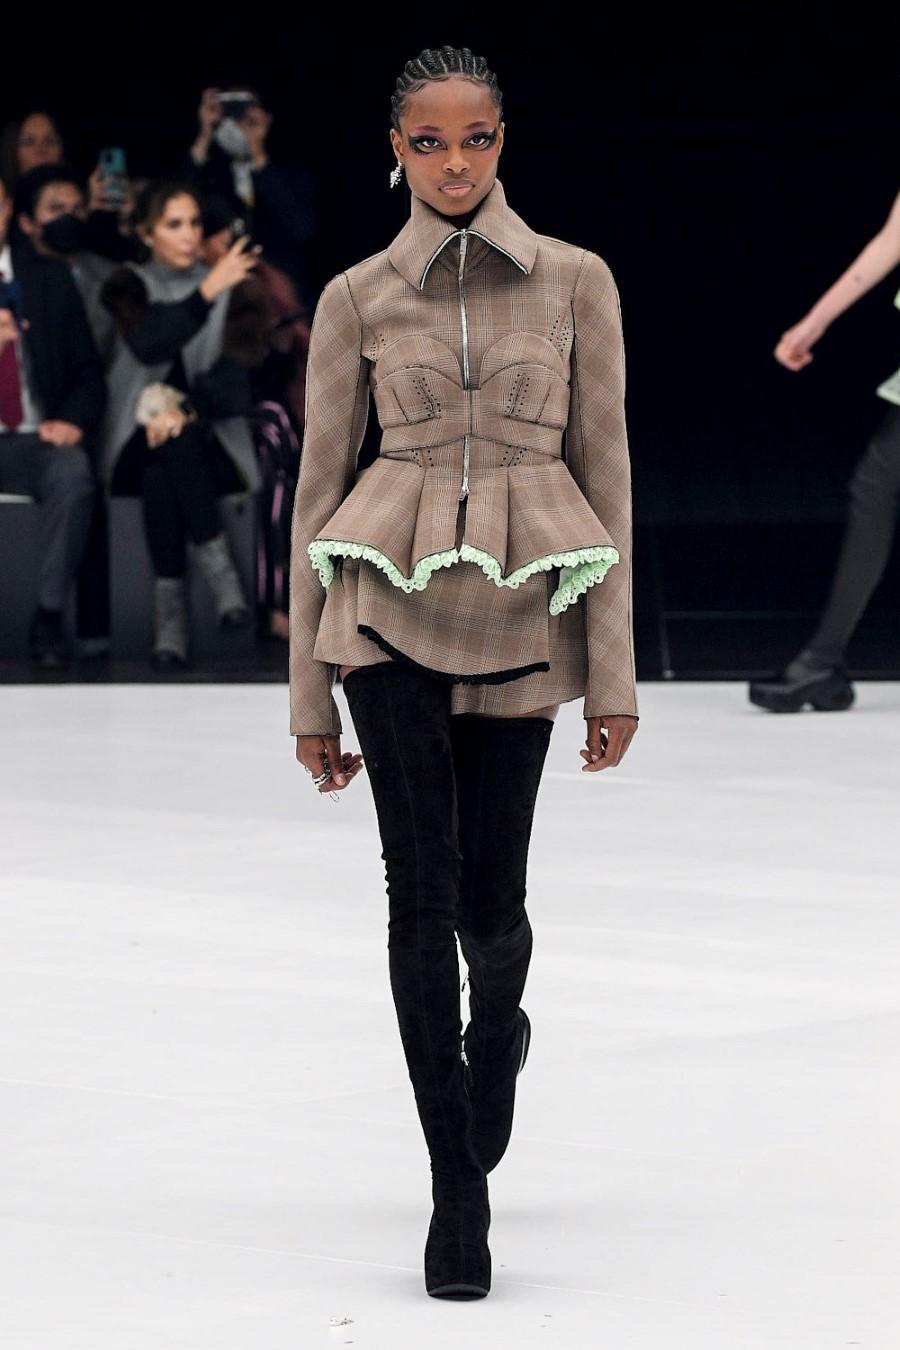 Givenchy Spring Summer 2022 - Paris Fashion Week